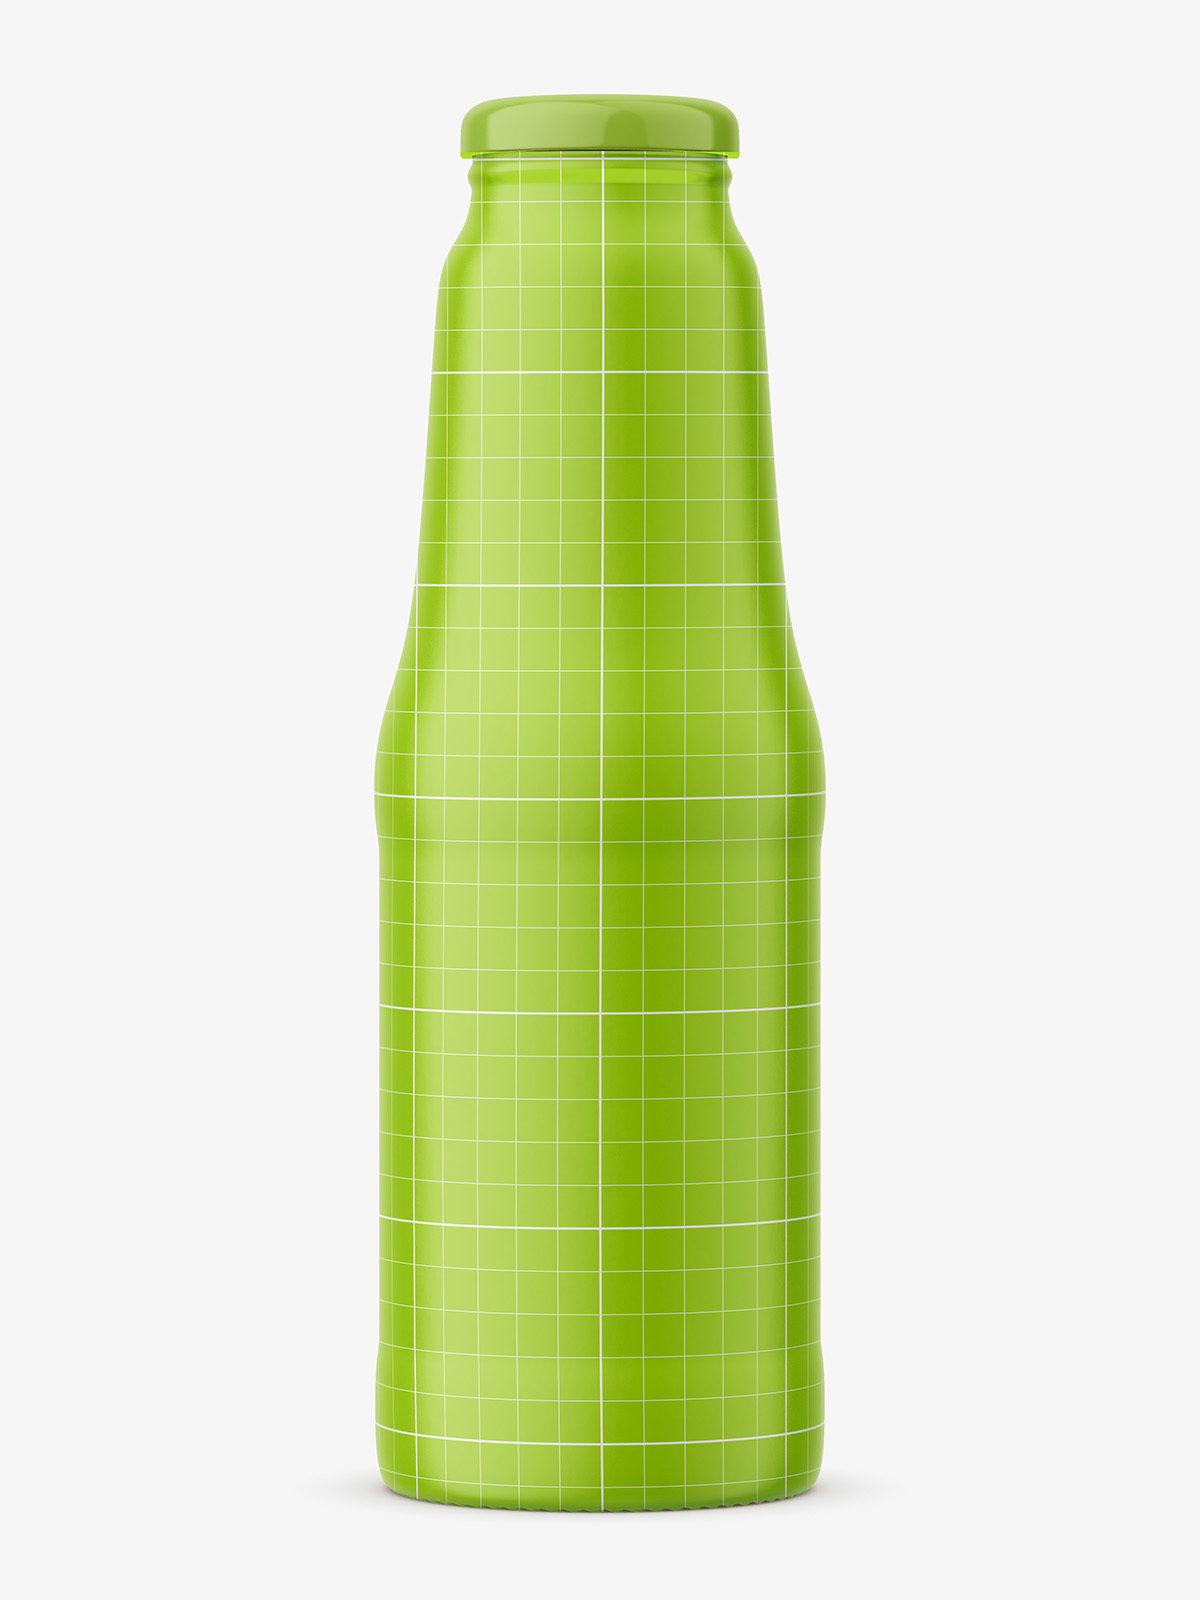 glass juice bottle mockup smarty mockups